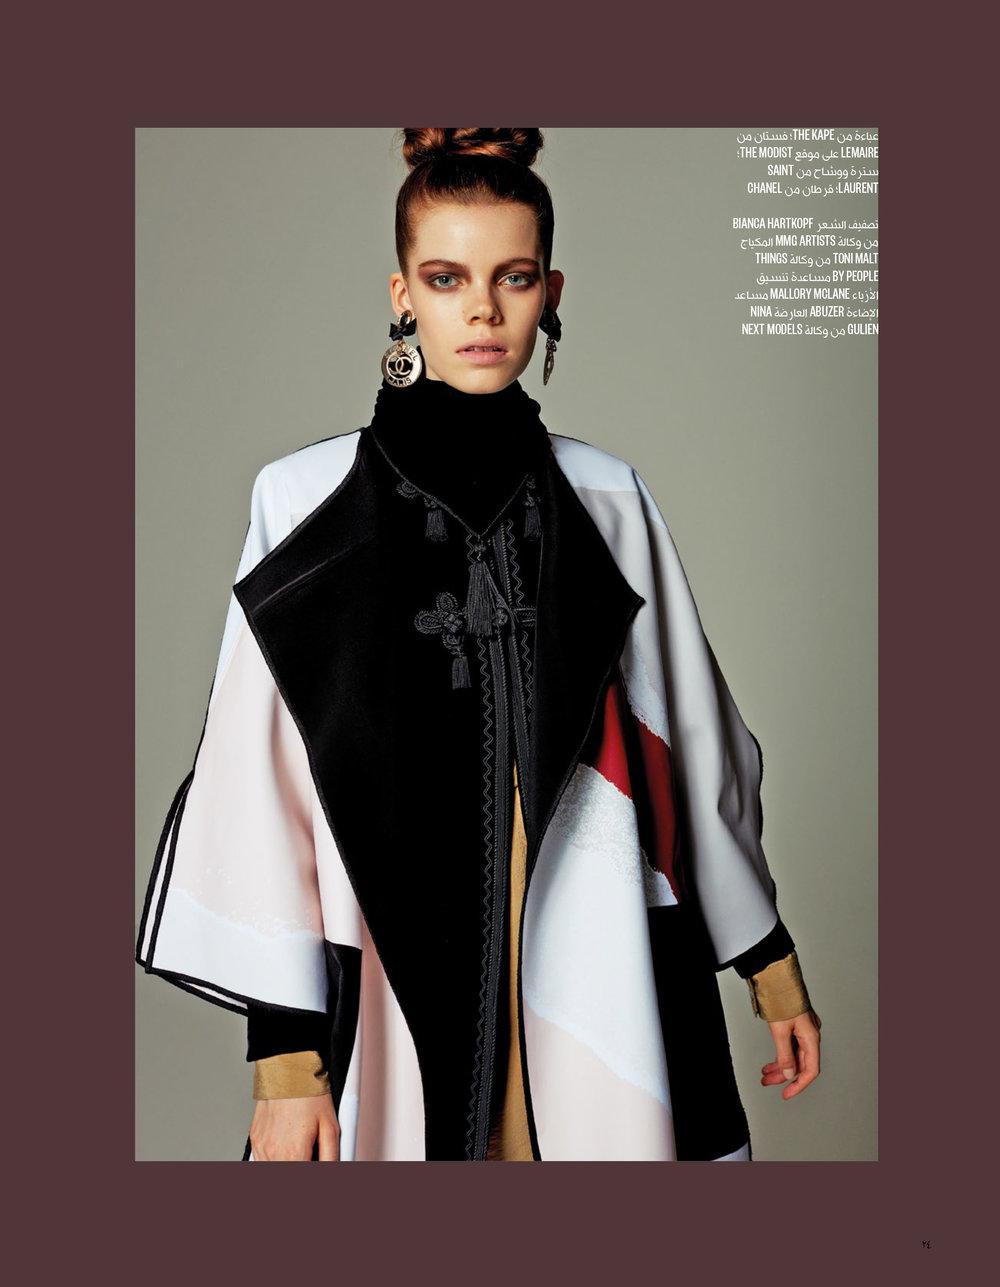 Vogue October Binder_Magzter (dragged)-3.jpg